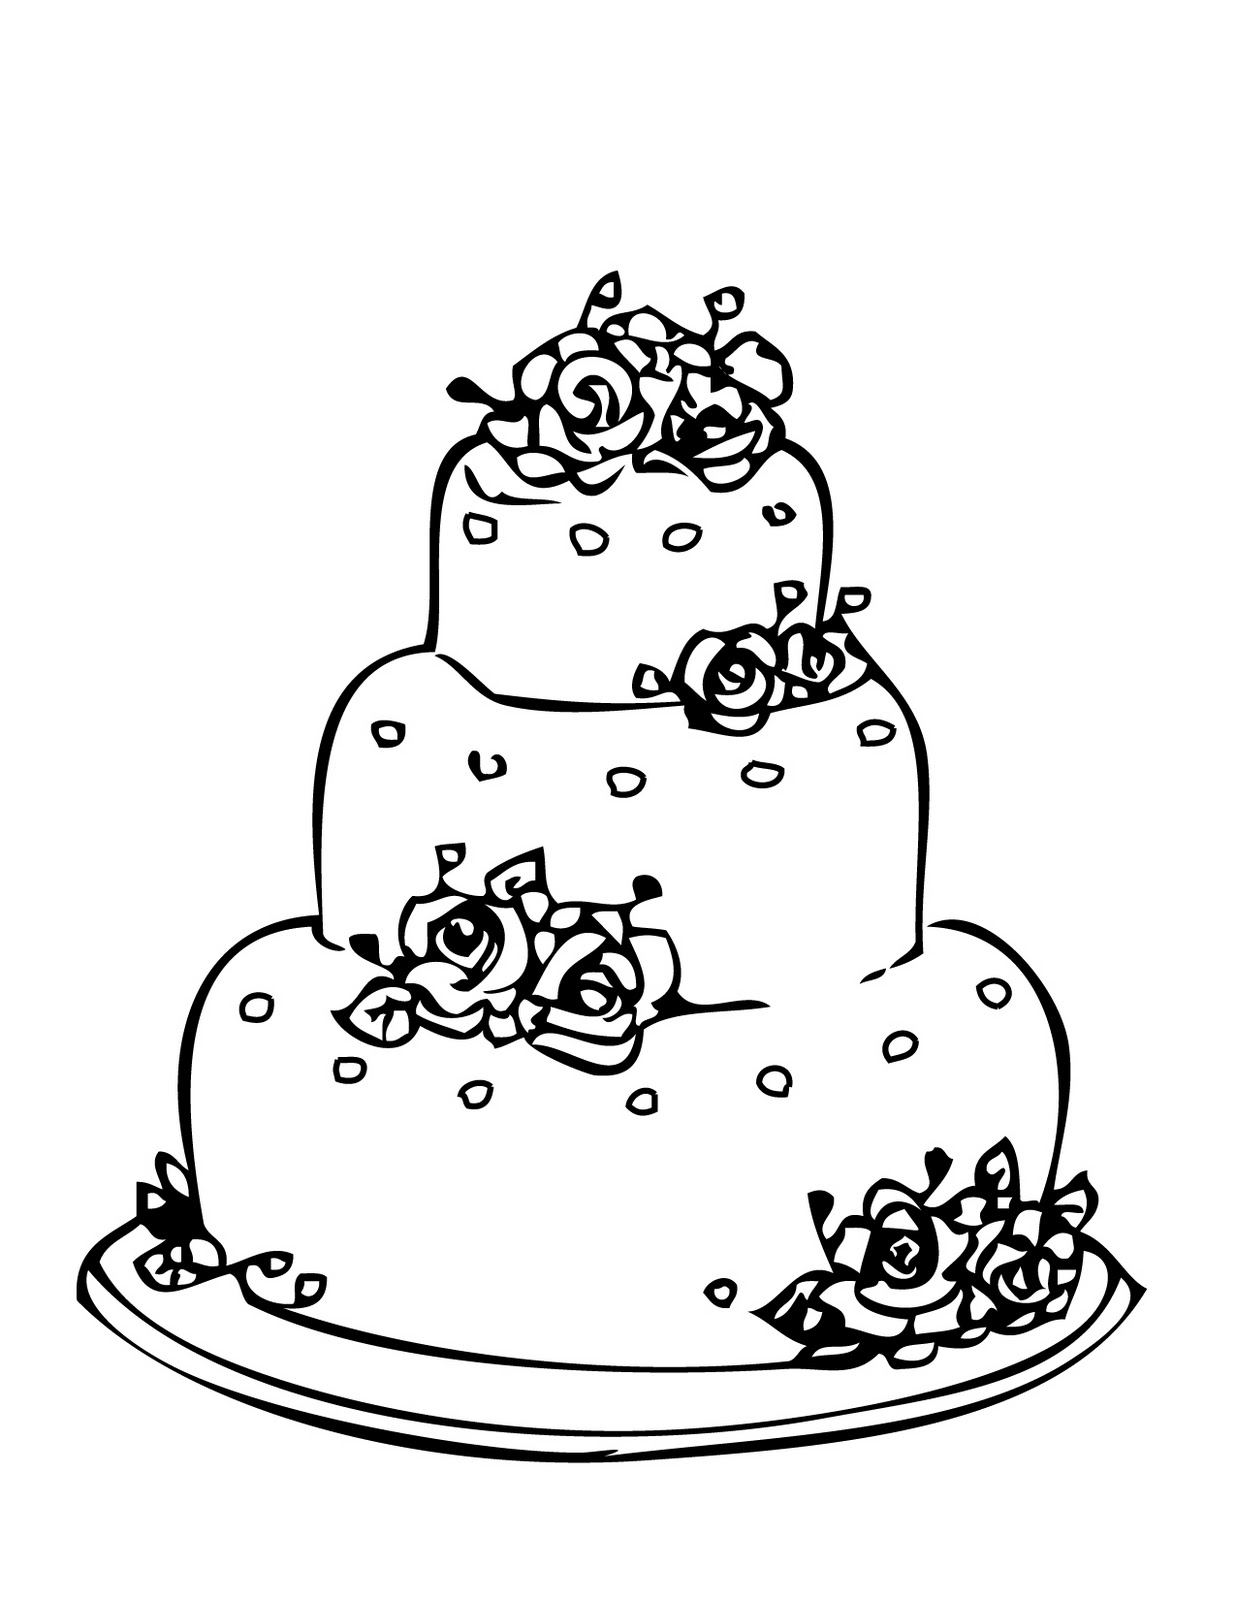 1236x1600 Birthday Cake Pencil Drawing Photos Drawn Birthday Sketch